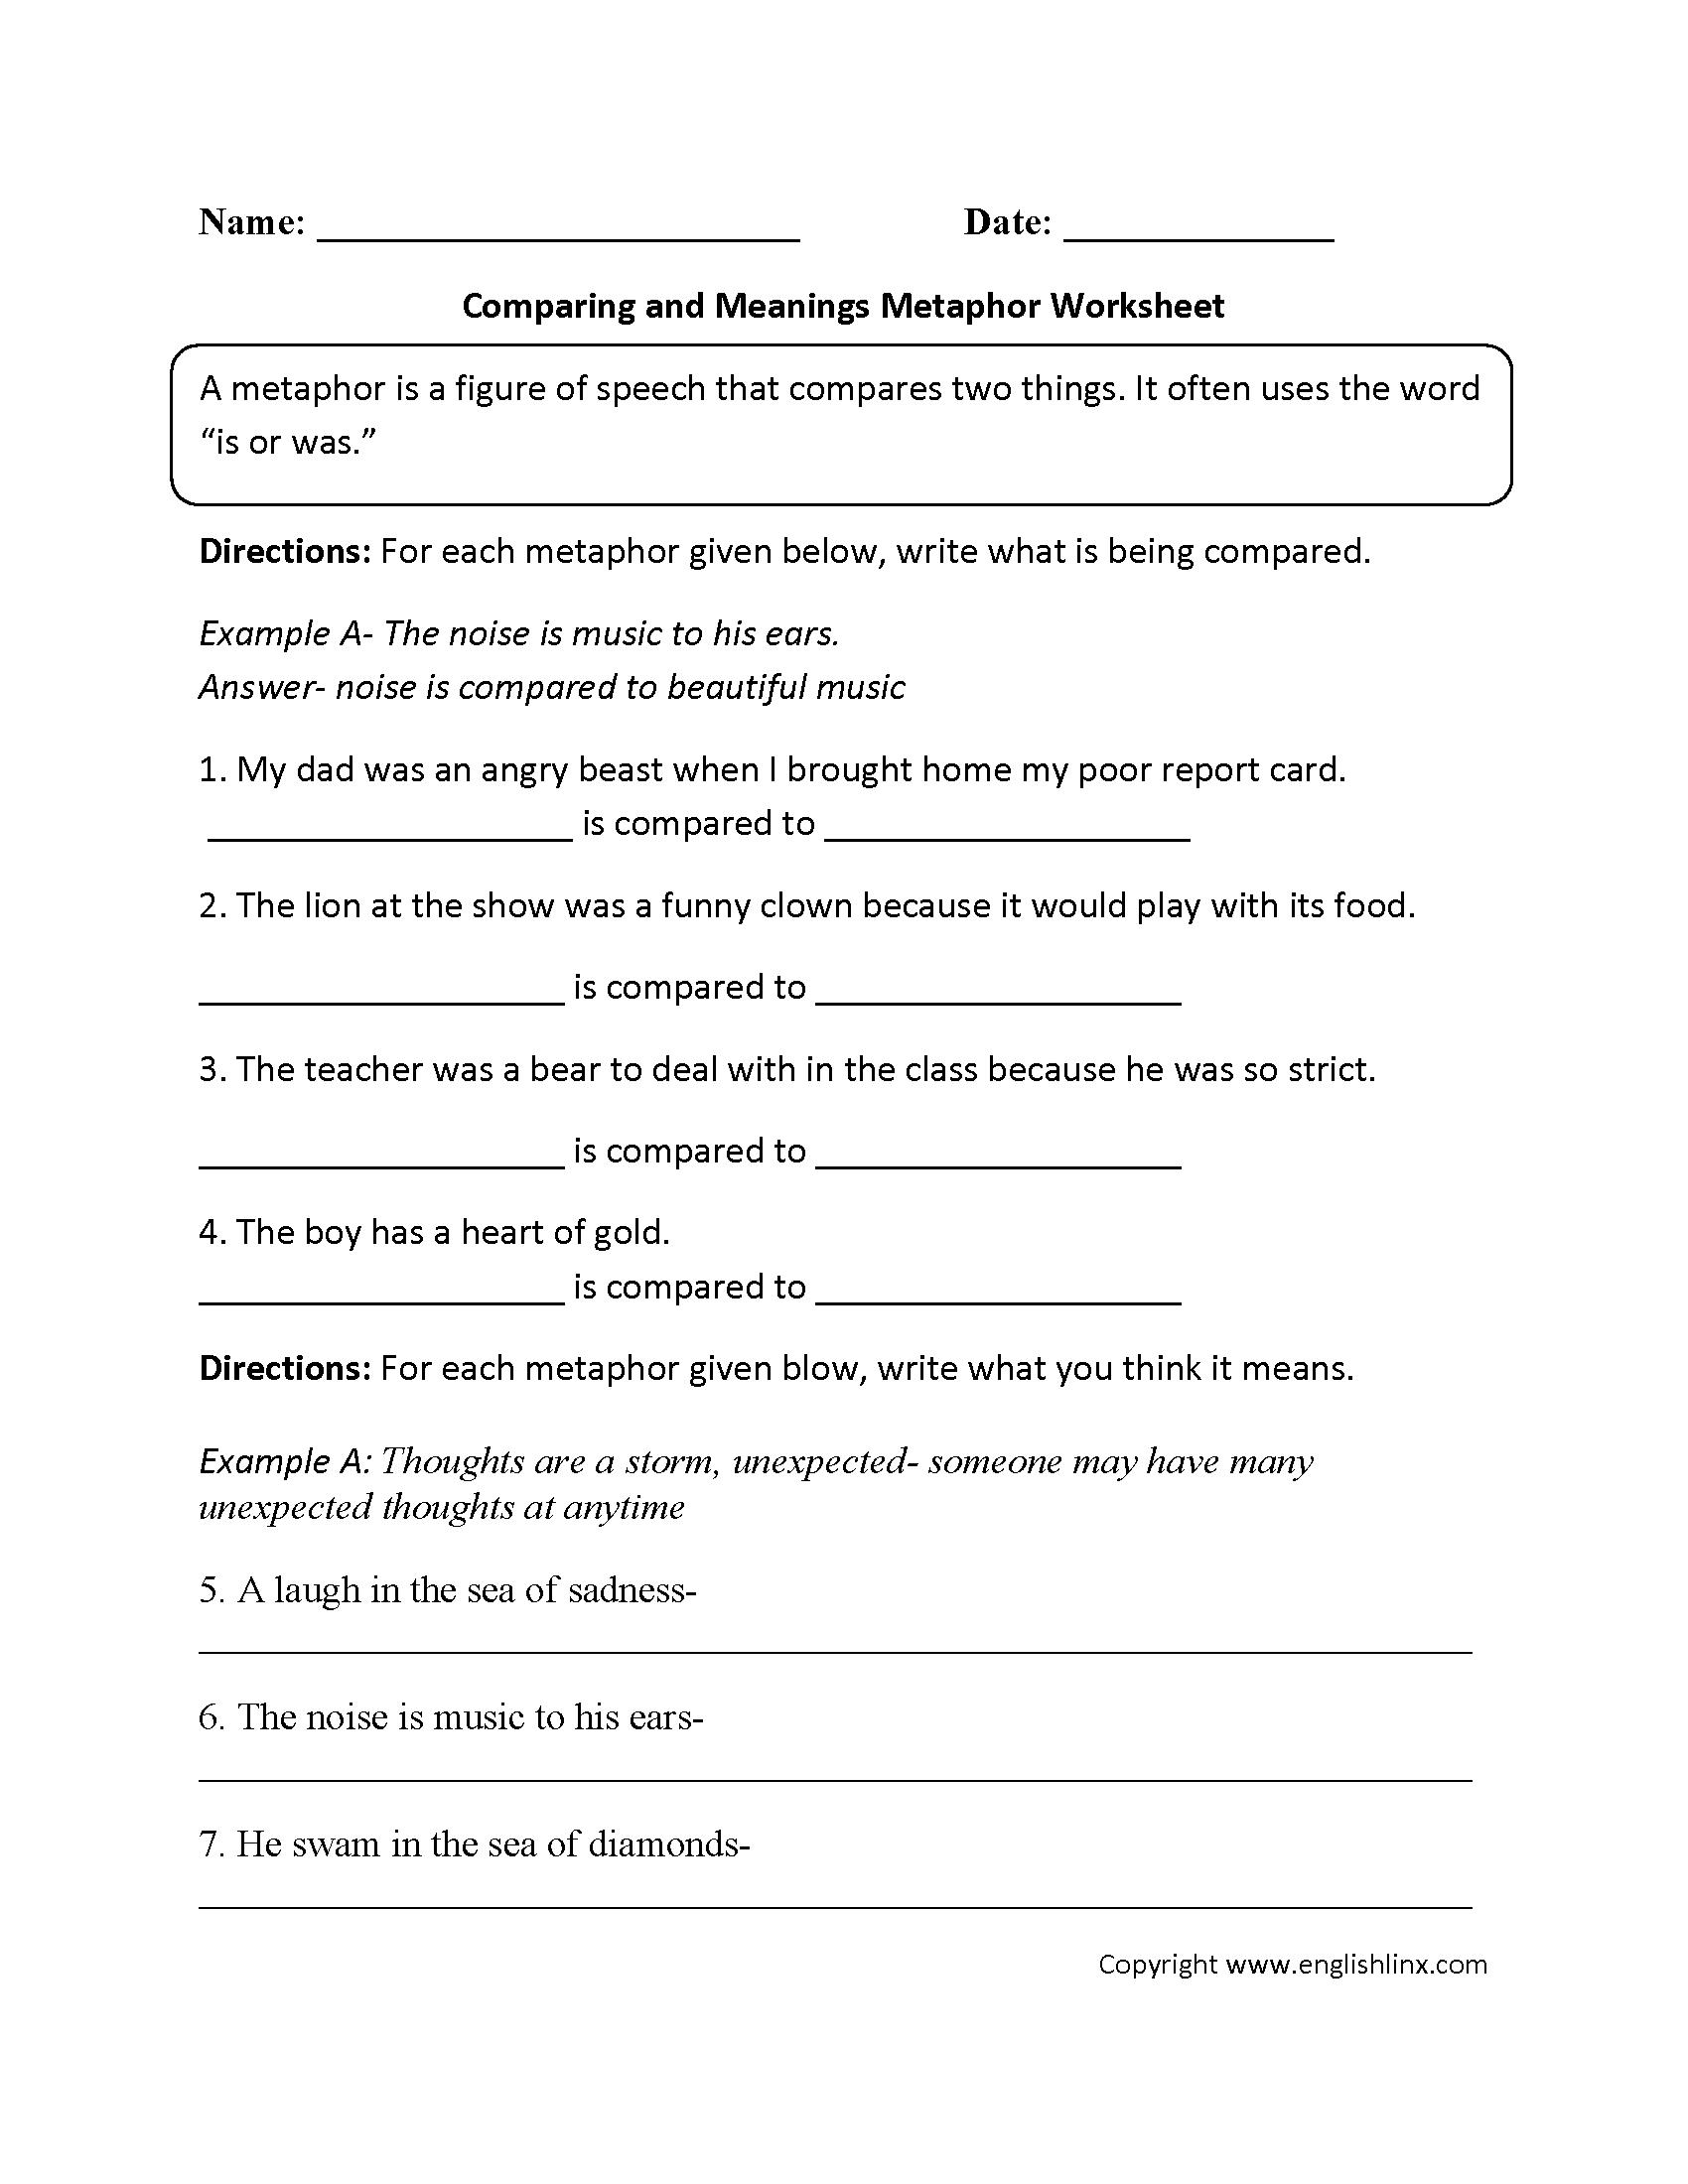 Worksheet On Metaphors For 5th Grade